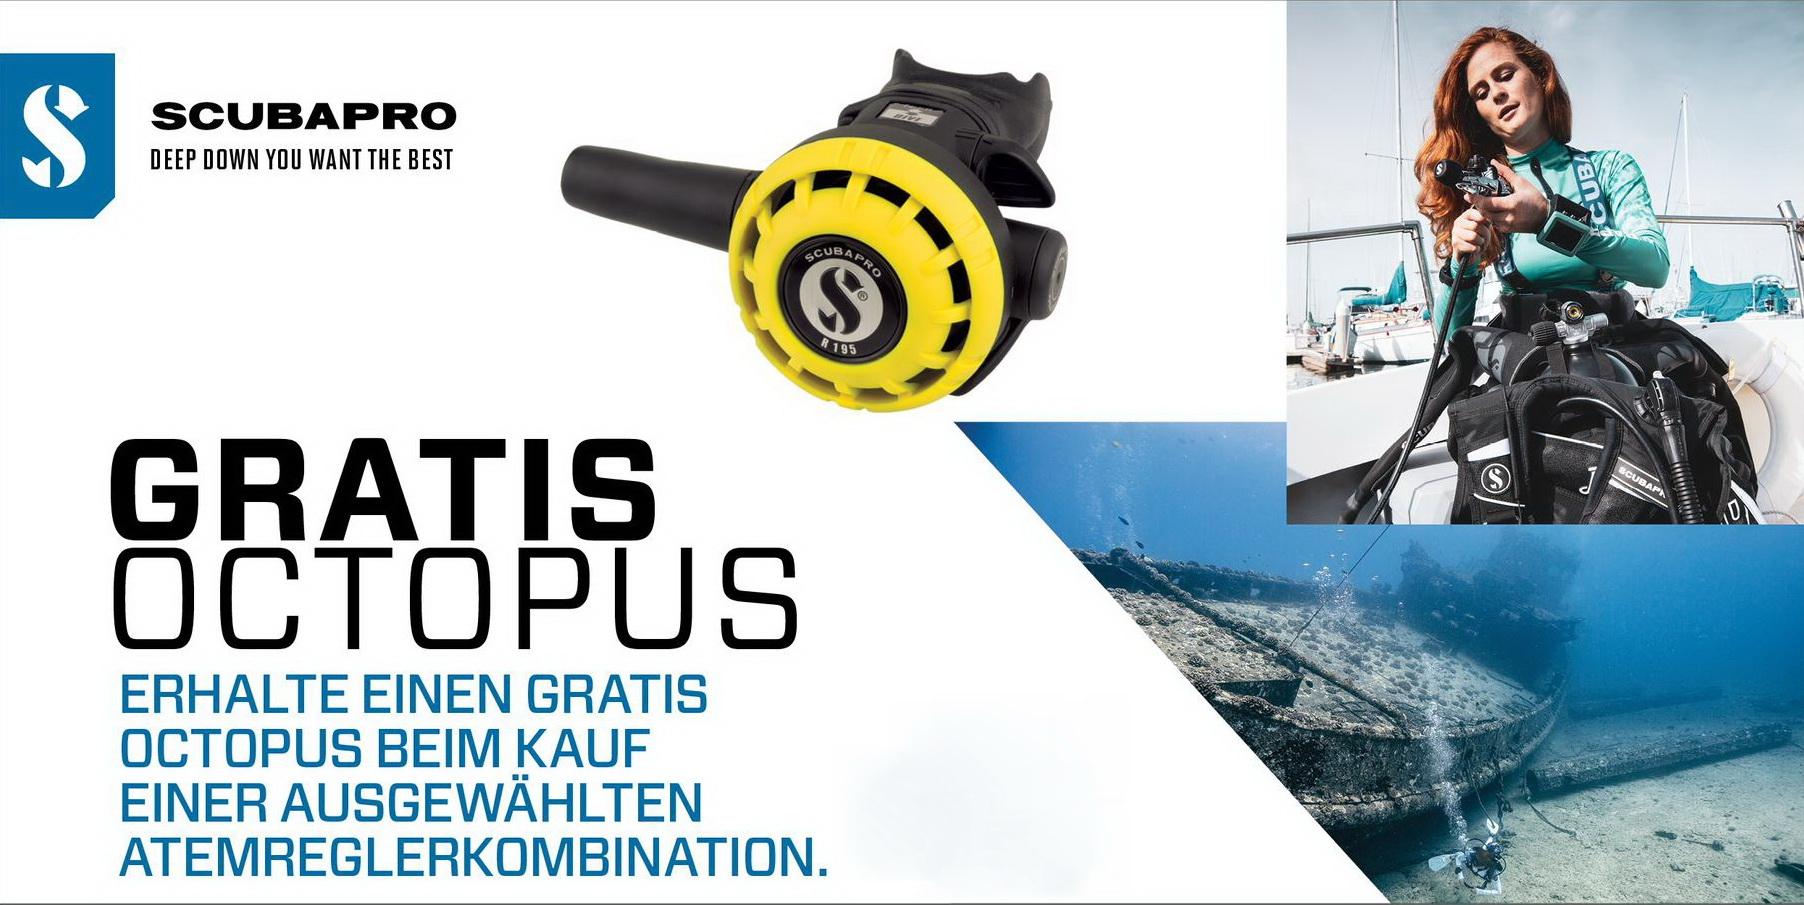 Scubapro gratis Octopus R190 Promo